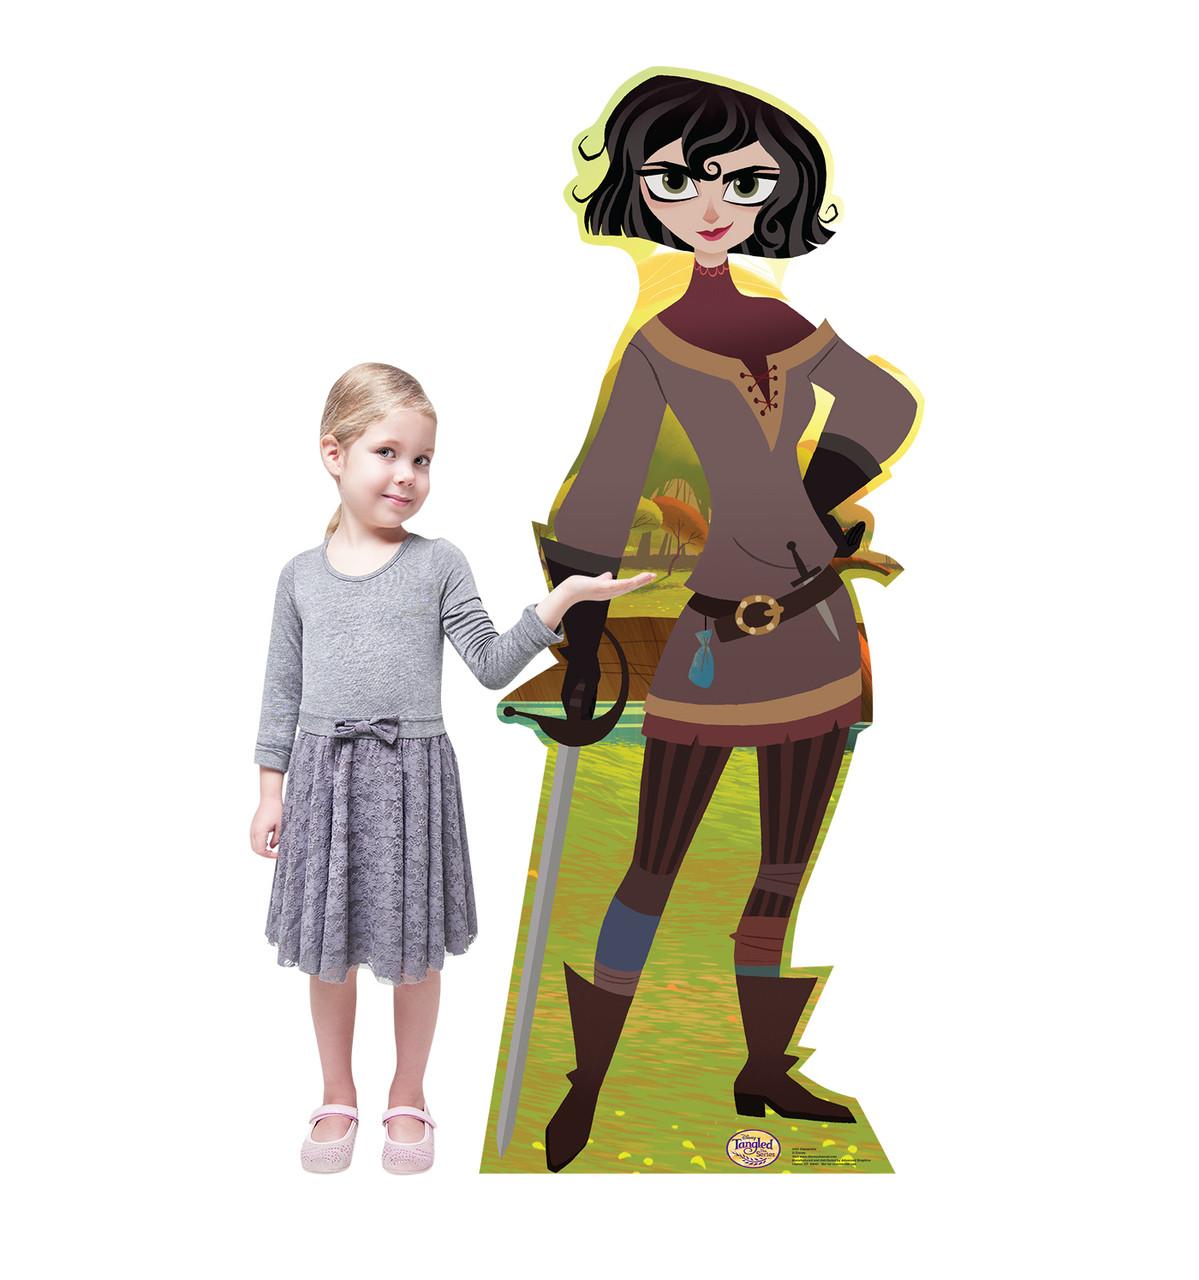 Life-size Cassandra (Tangled The Series) Cardboard Standup 2